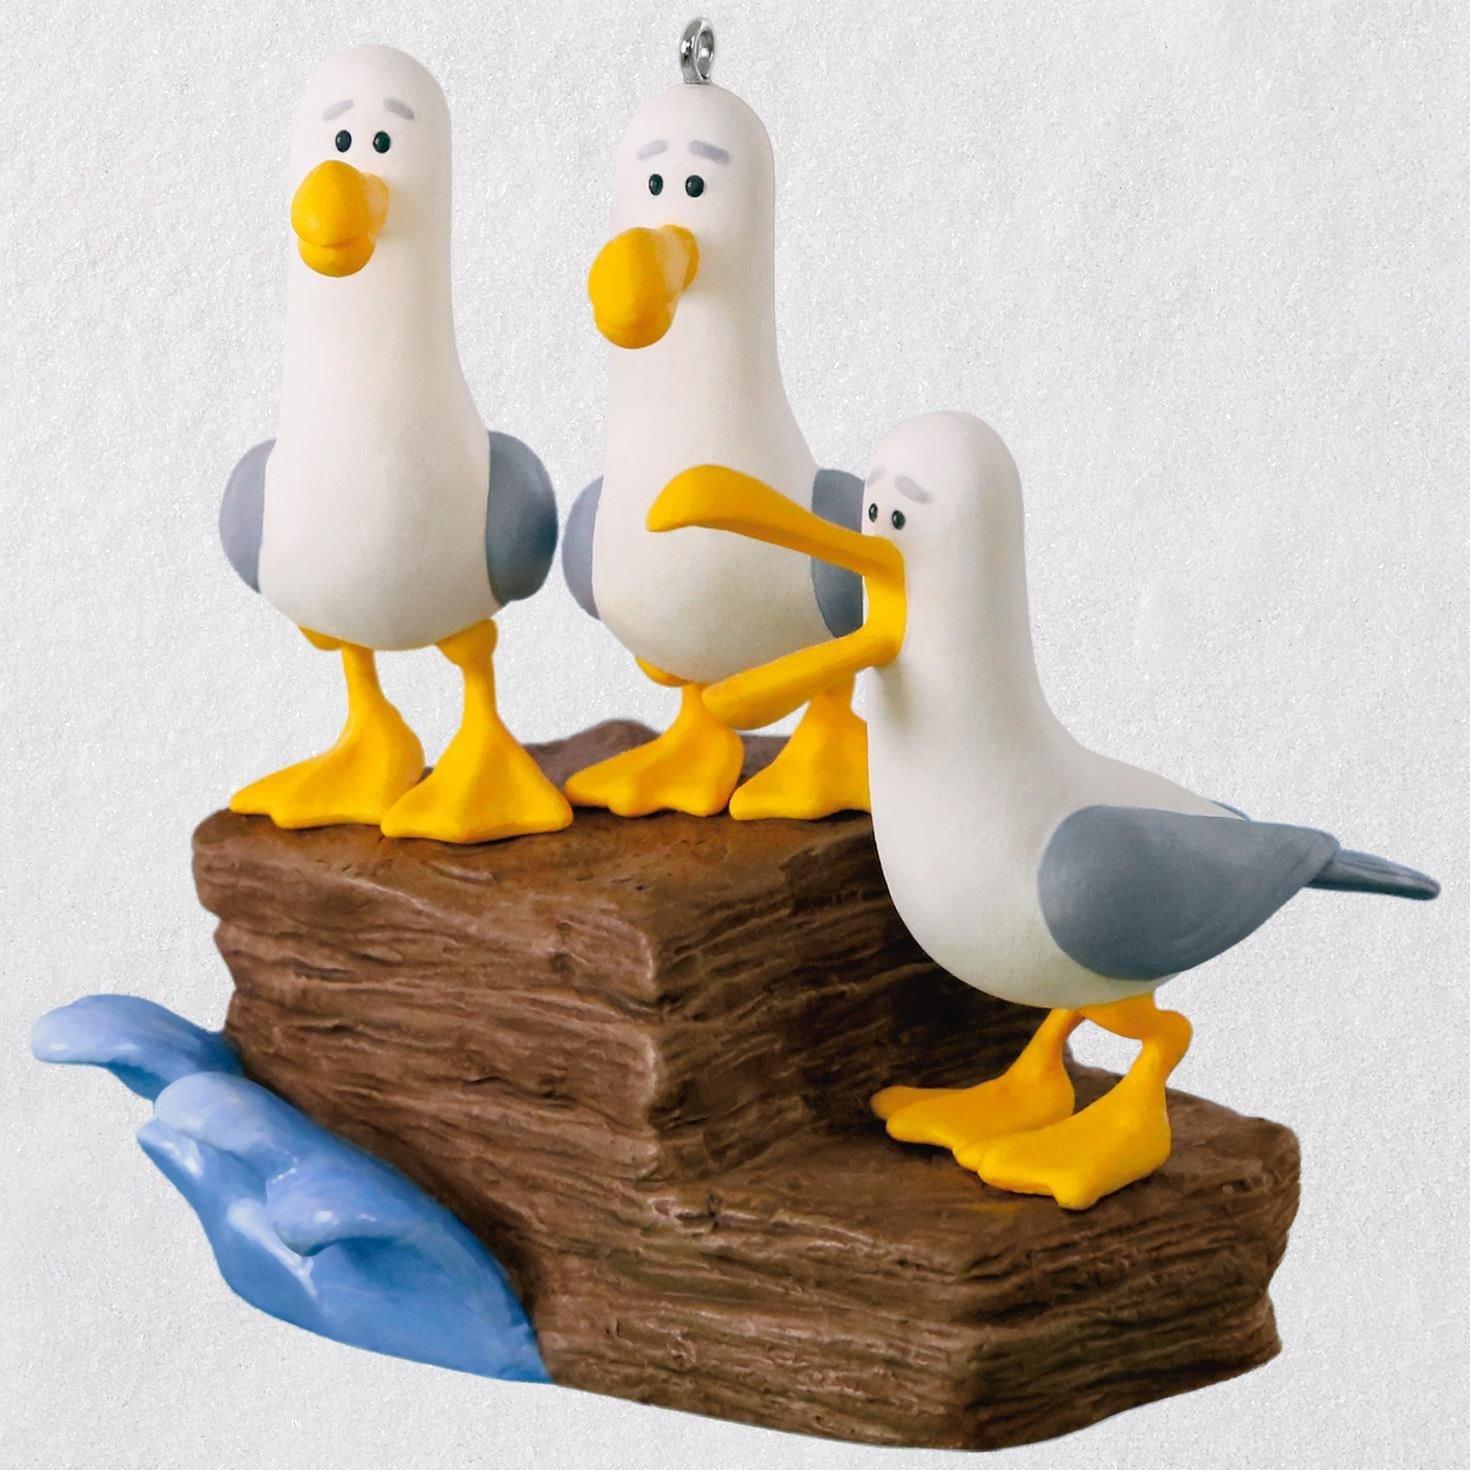 Hallmark Disney/Pixar Finding Nemo Mine! Mine! Mine! Seagulls Ornament With Sound keepsake-ornaments Movies & TV